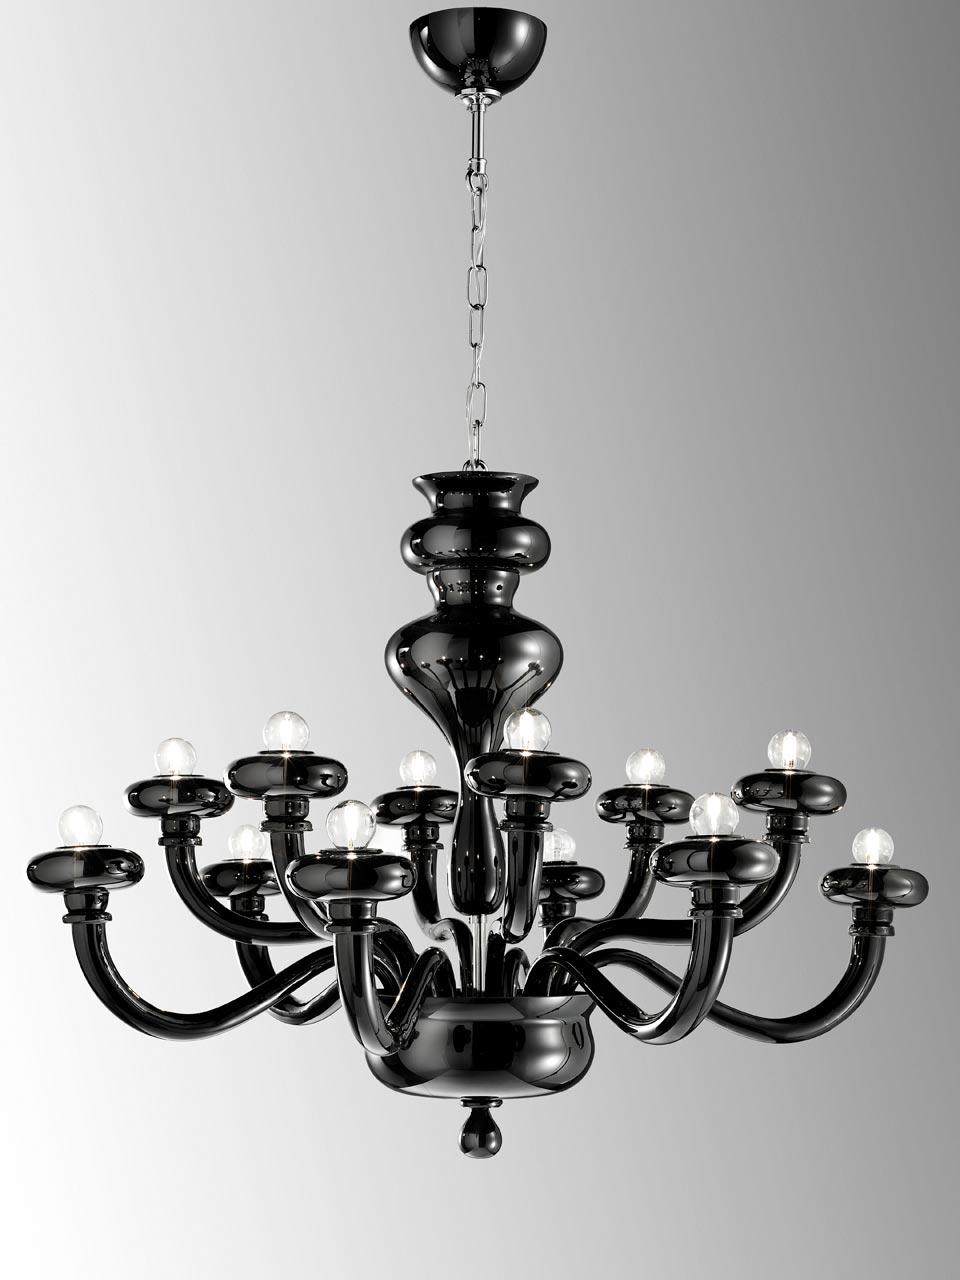 lustre noir lustre luminaire leroy merlin lustre suspension et pin lustre baroque rouge on. Black Bedroom Furniture Sets. Home Design Ideas